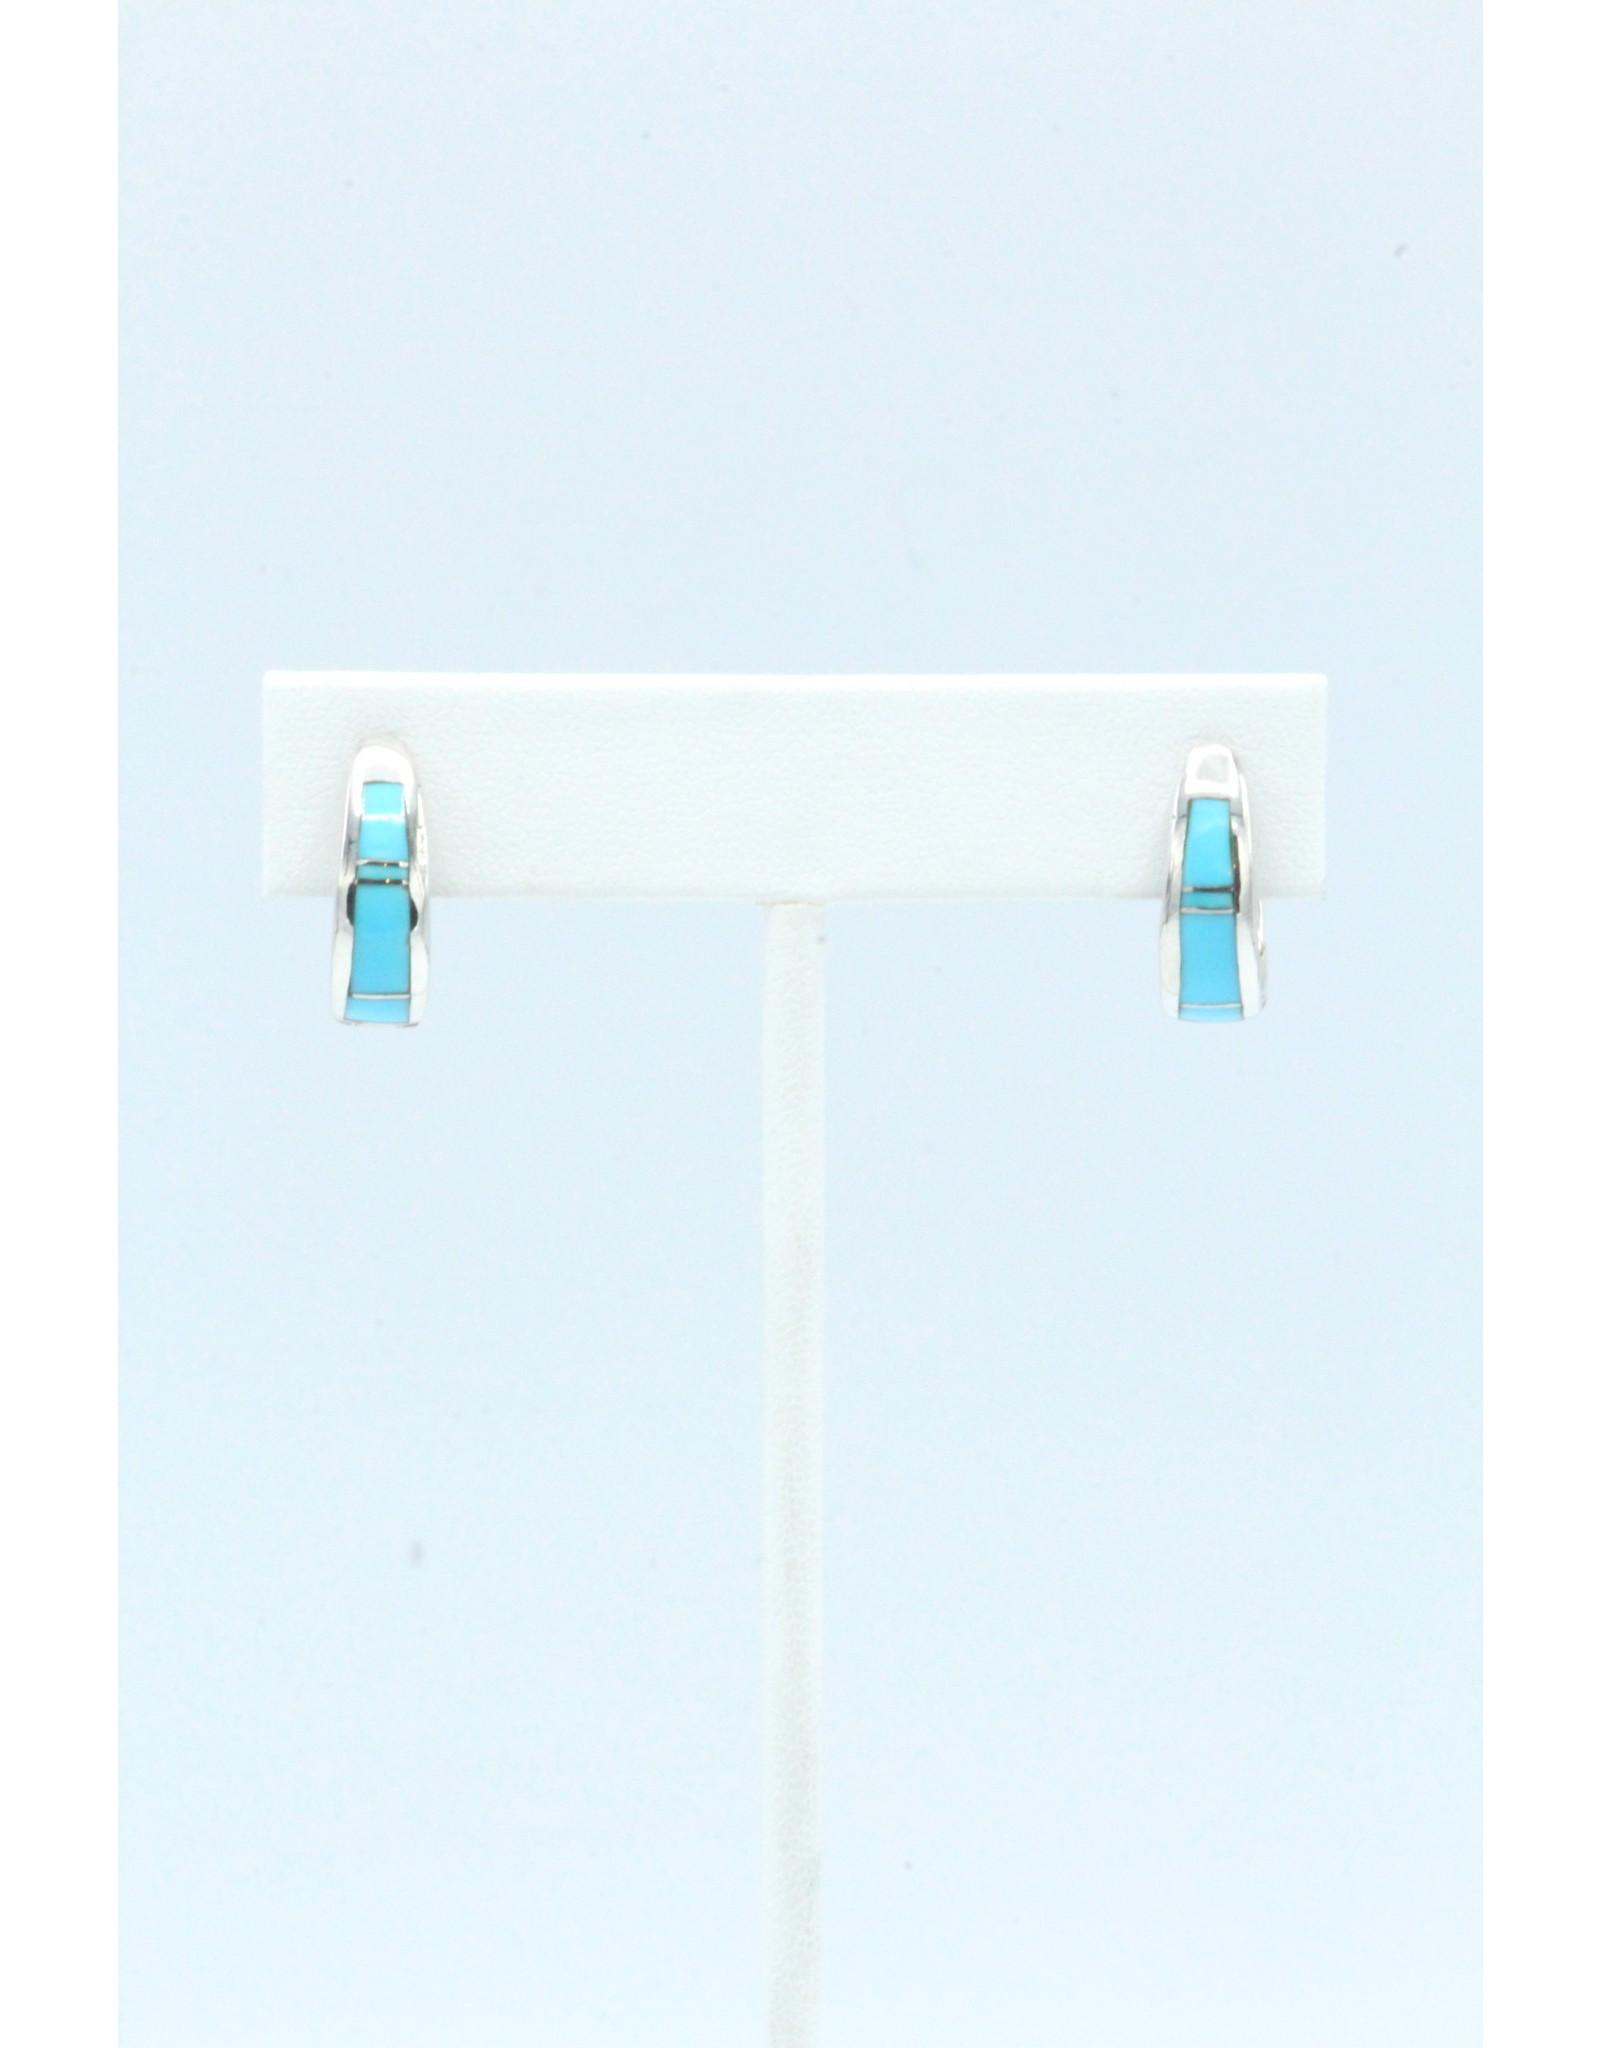 Turquoise Mini Hoop Earrings-ER306-3